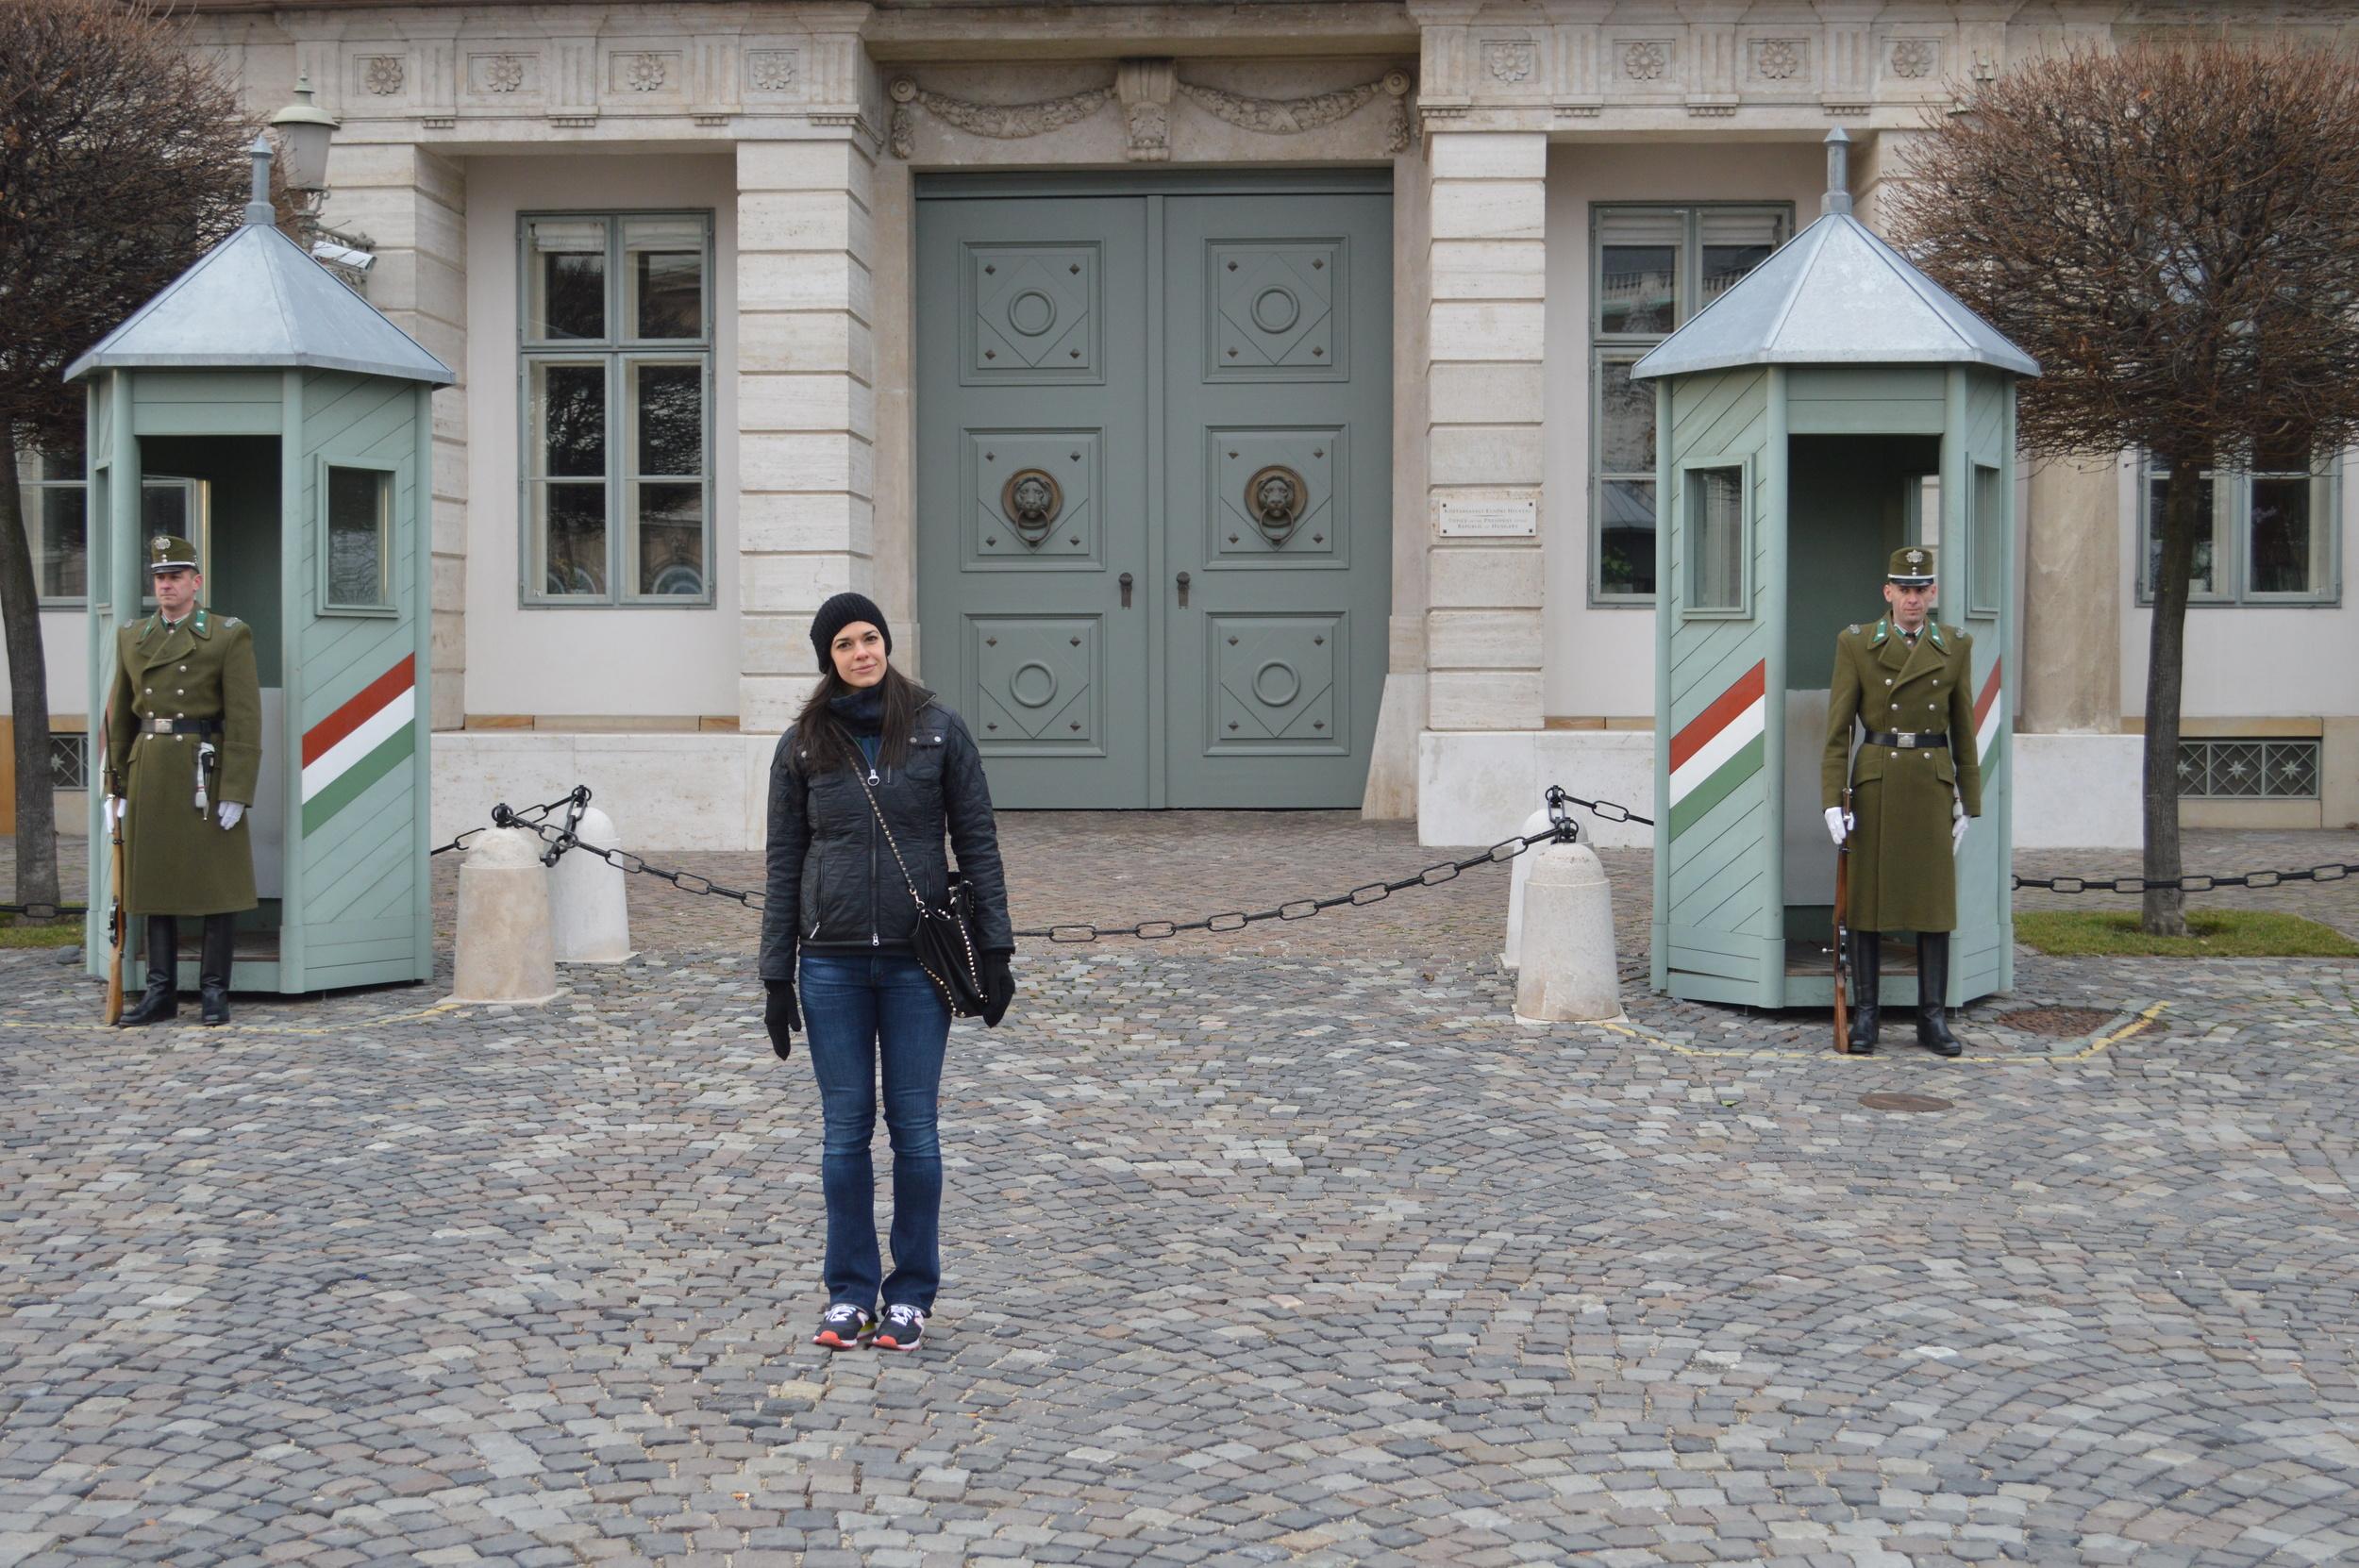 Budapest, Hungary - Lauren Schwaiger